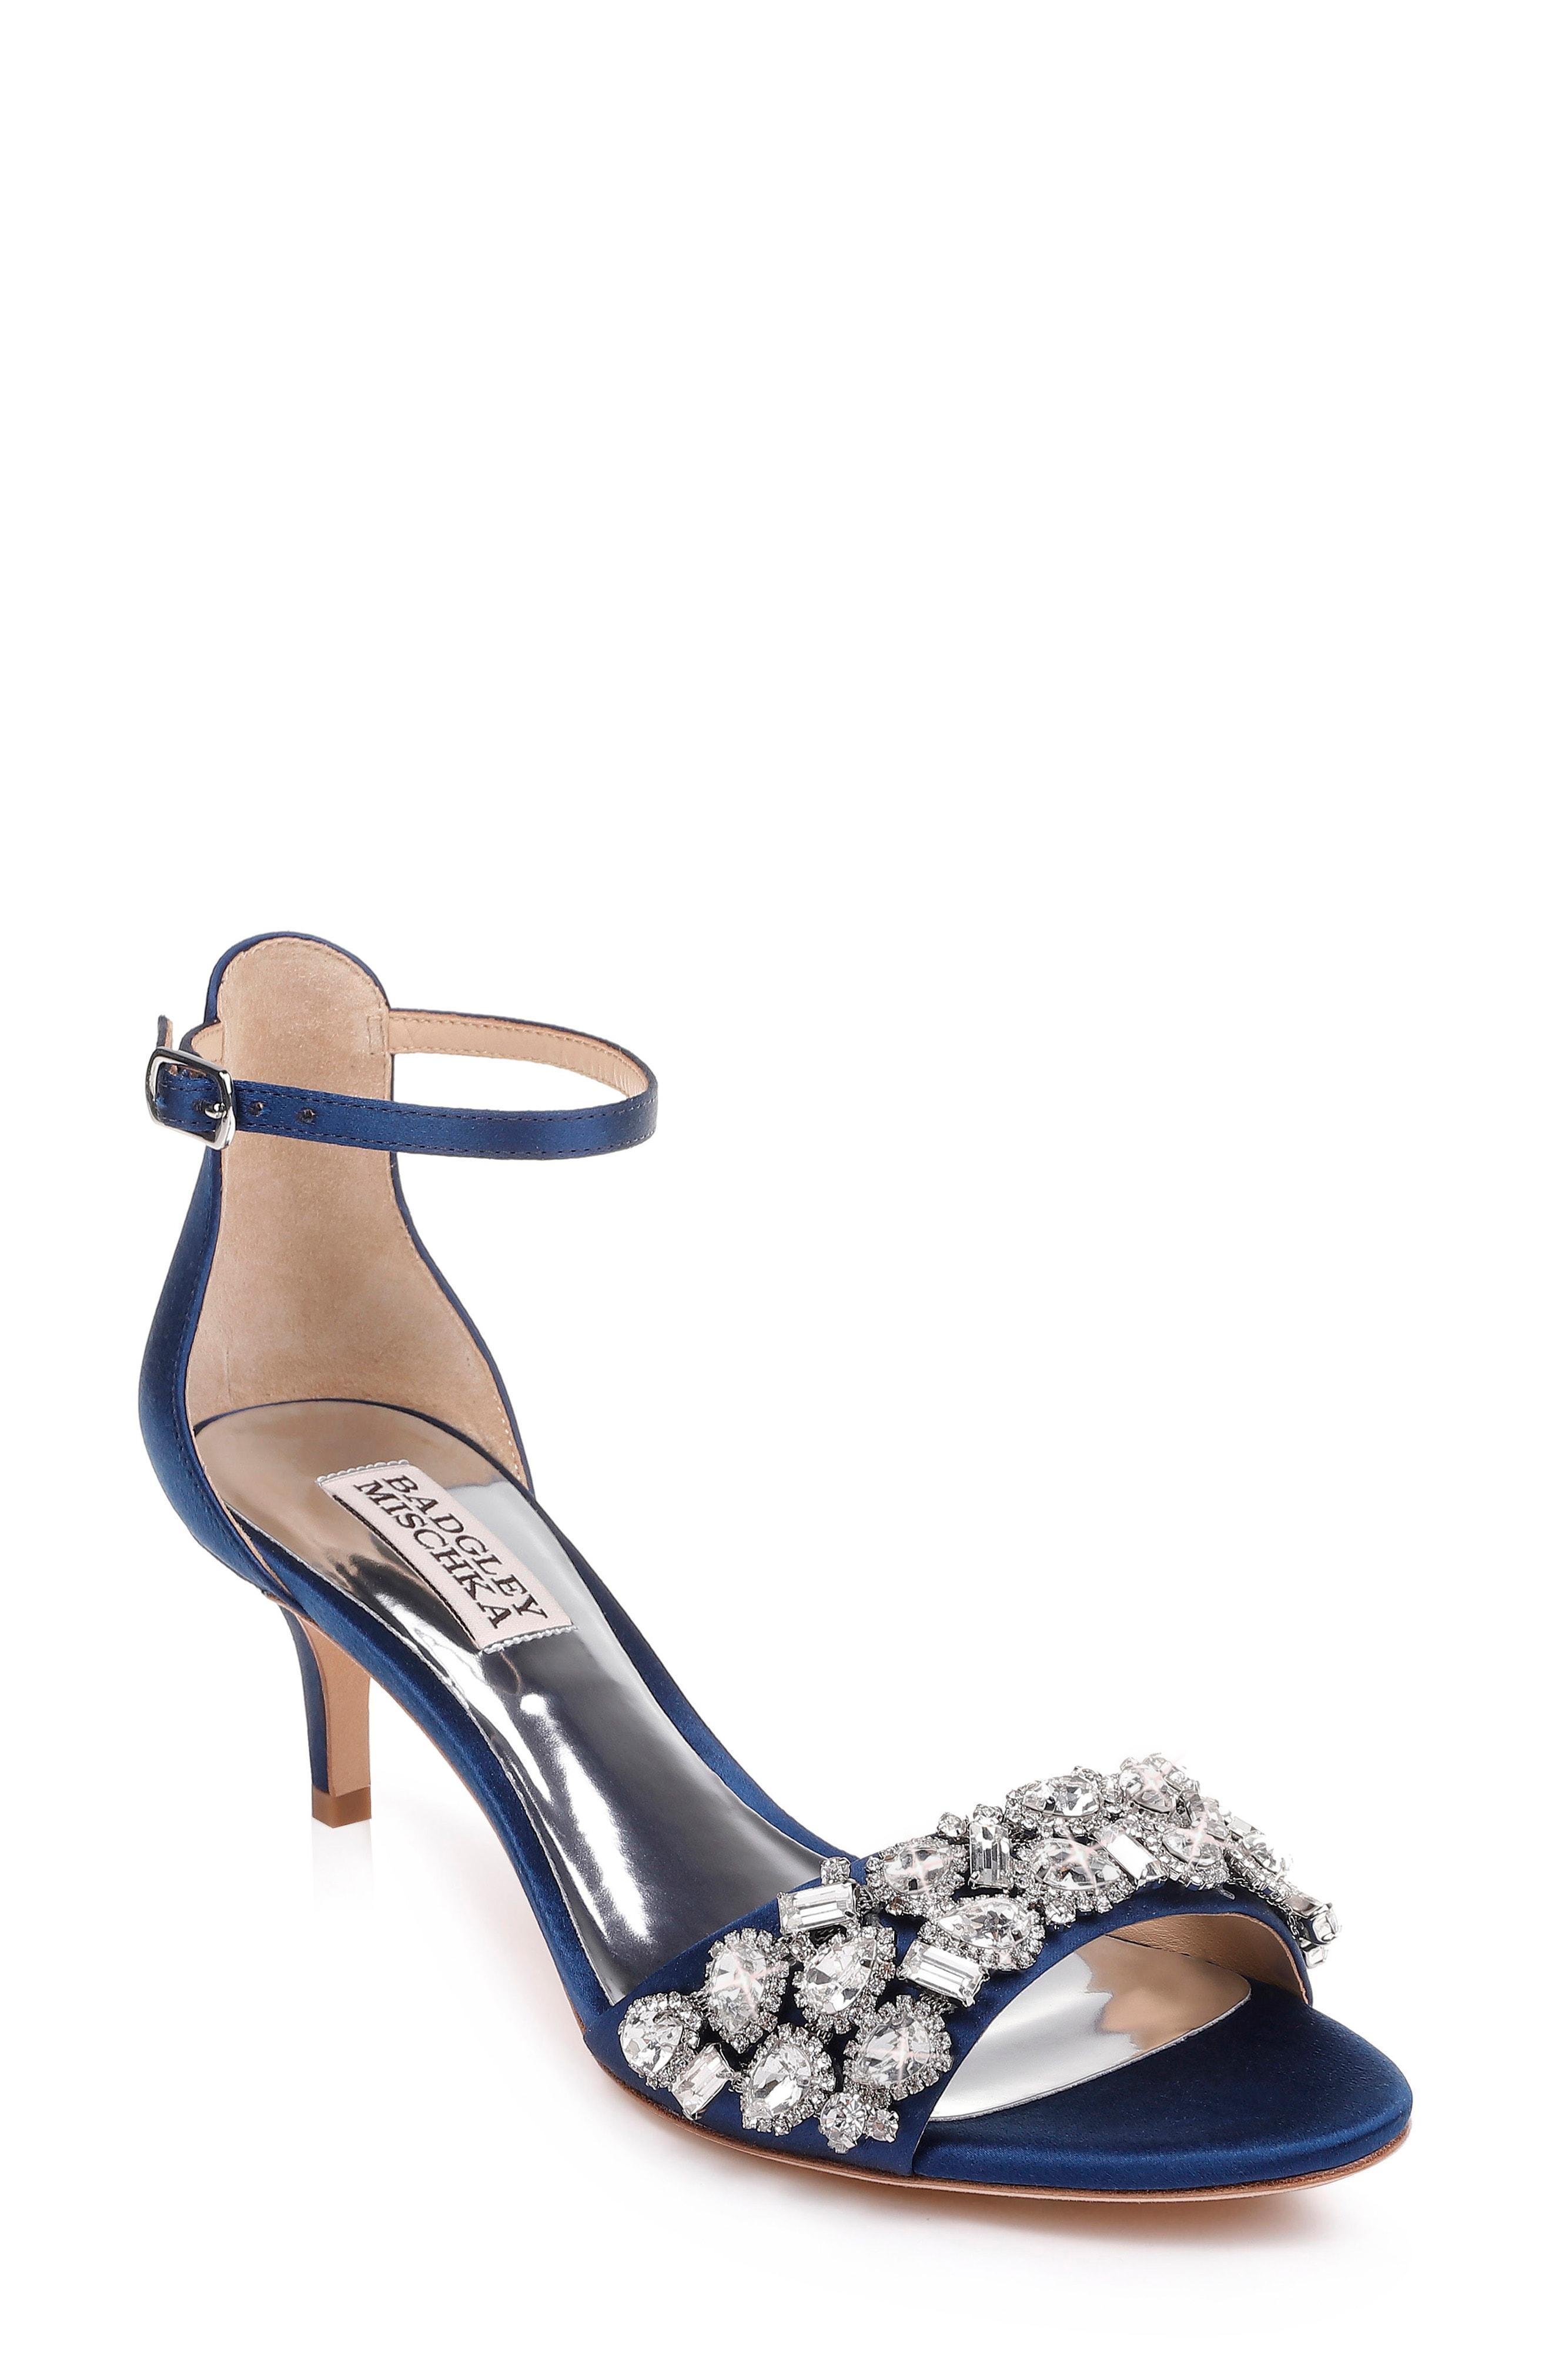 2907766f0468 Badgley Mischka. Women s Blue Badgley Mischka Lara Crystal Embellished  Sandal